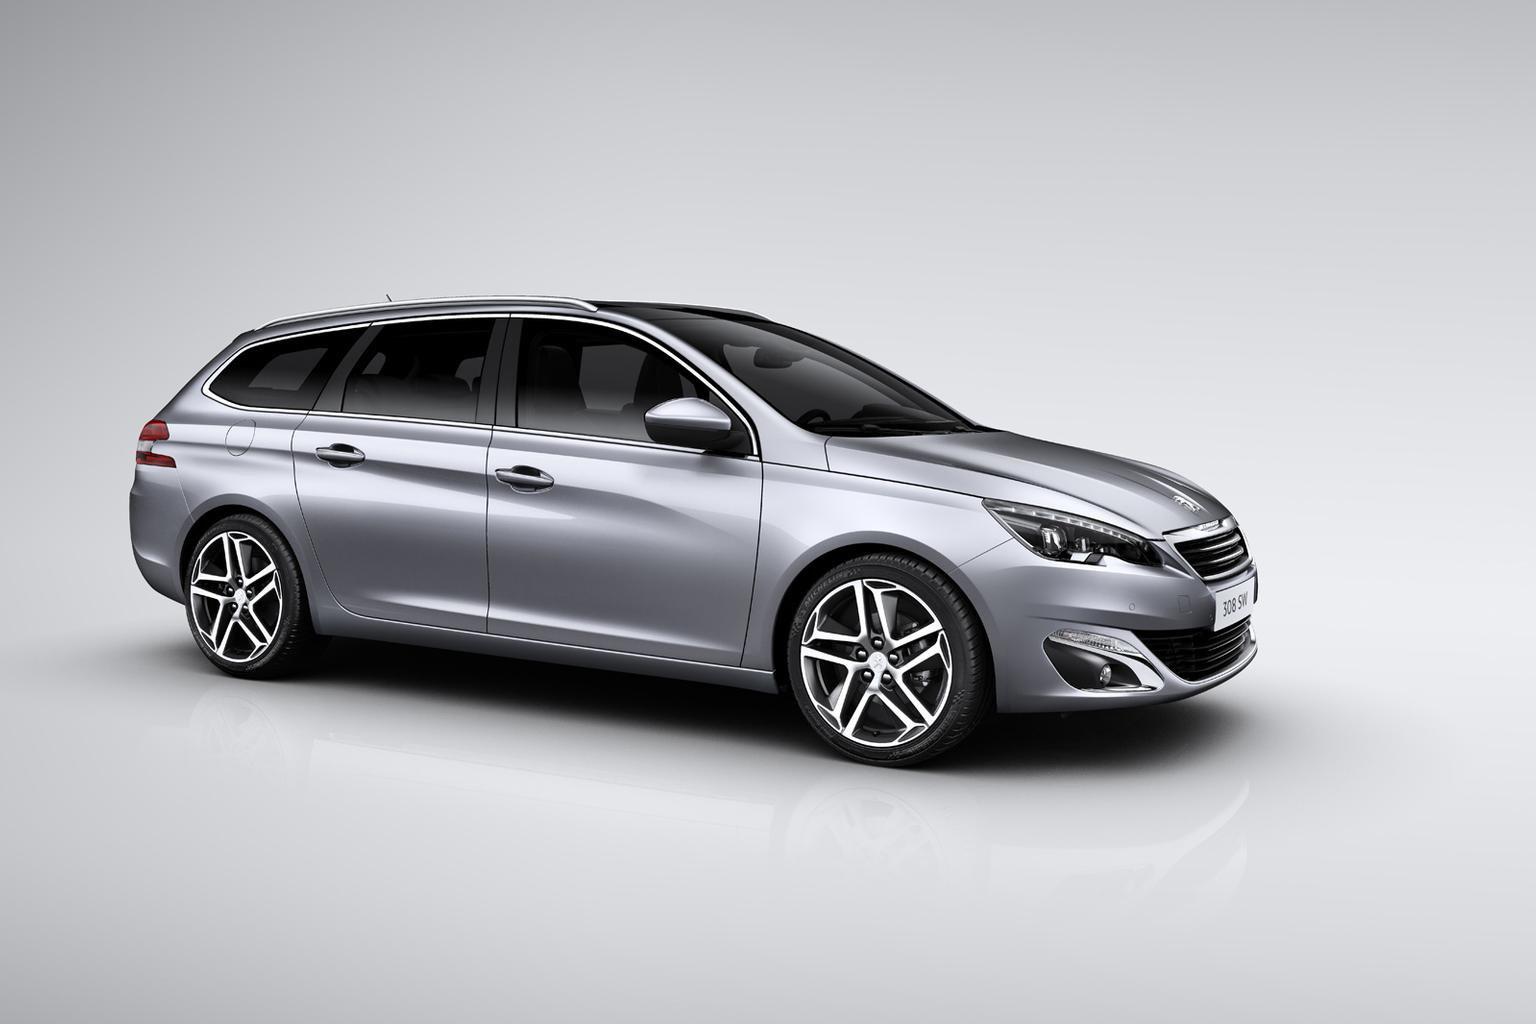 New Peugeot 308 SW estate revealed